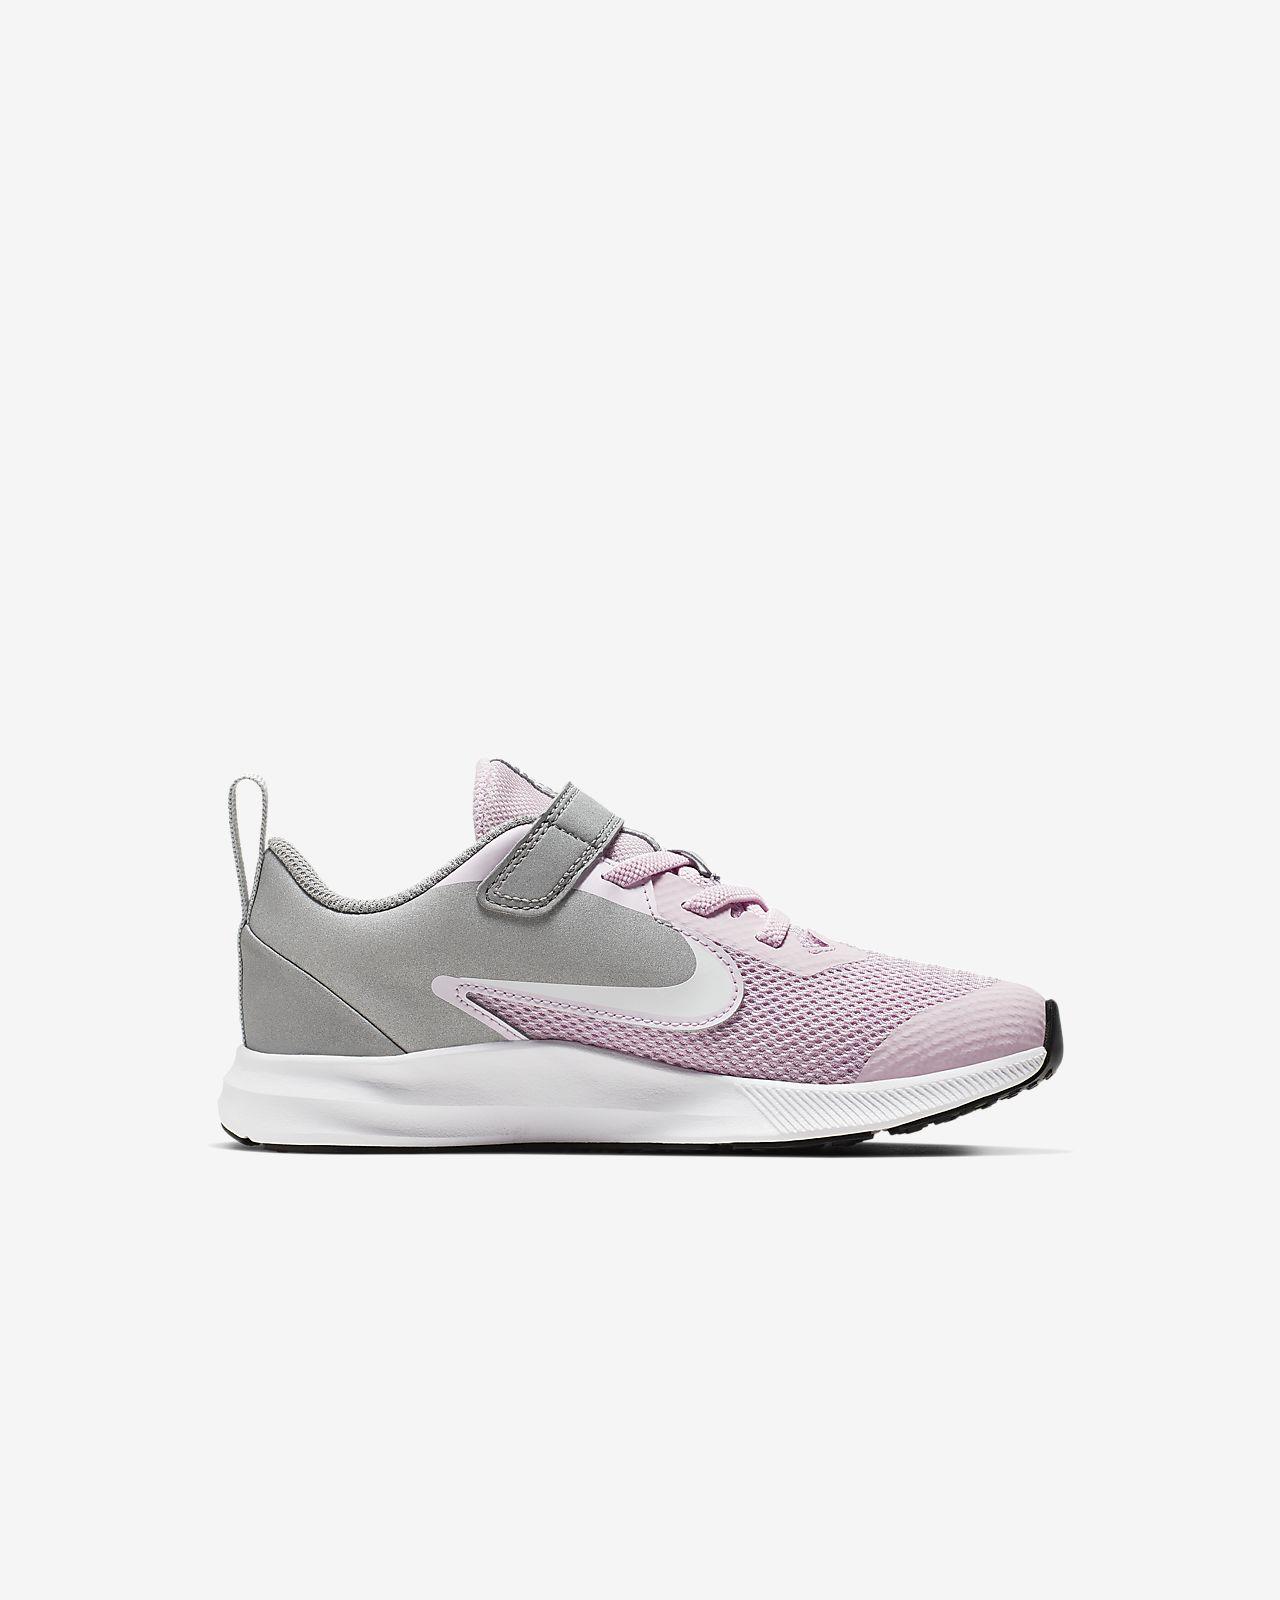 Downshifter Nike 9 für Kinder jüngere Schuh xECrdWQBoe